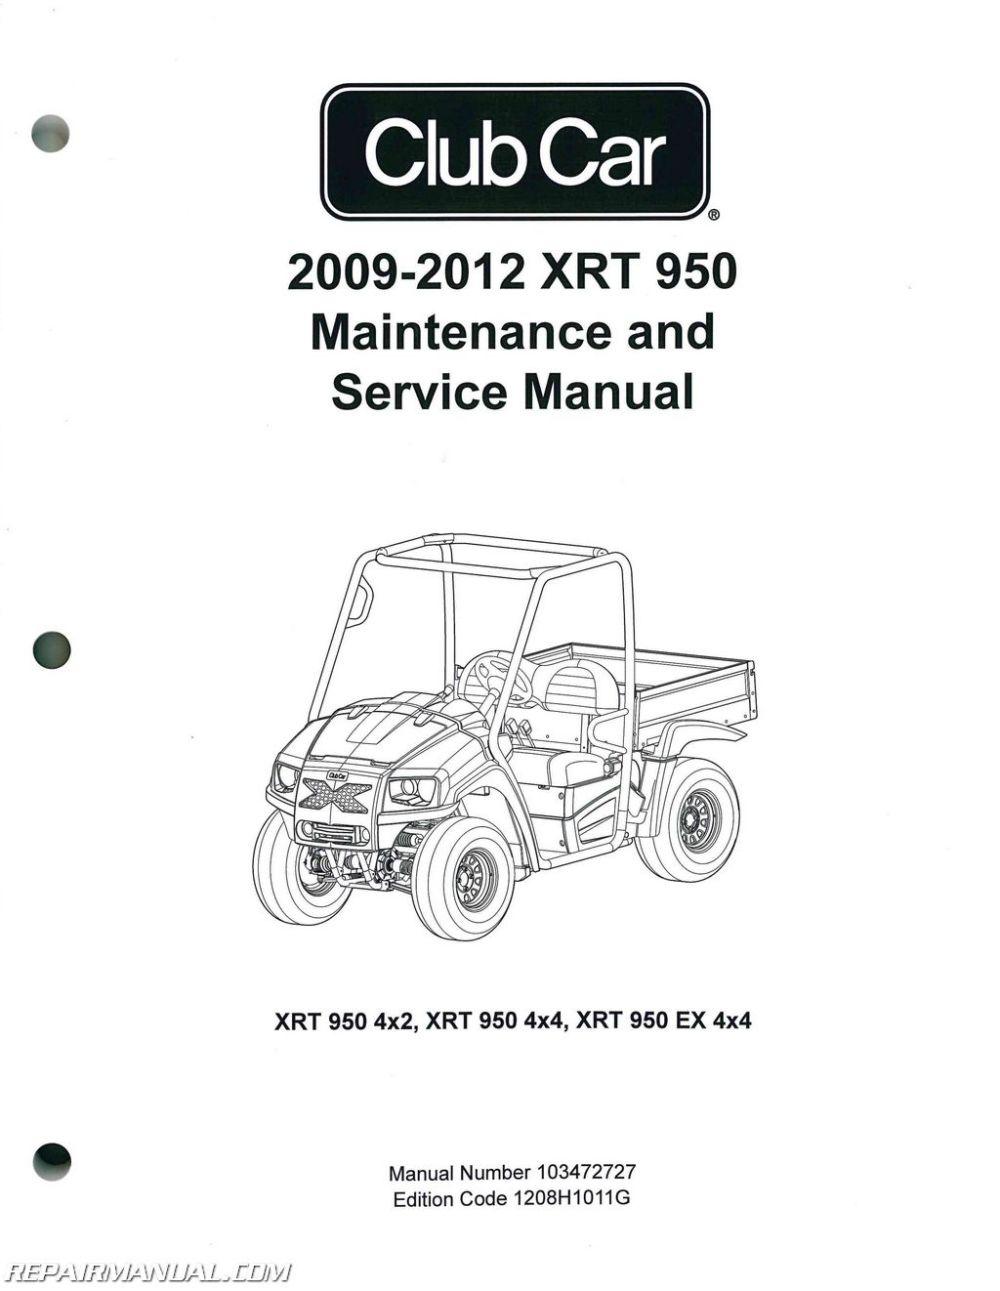 medium resolution of 2009 2012 club car xrt 950 maintenance golf cart service manual2012 club car wiring diagram